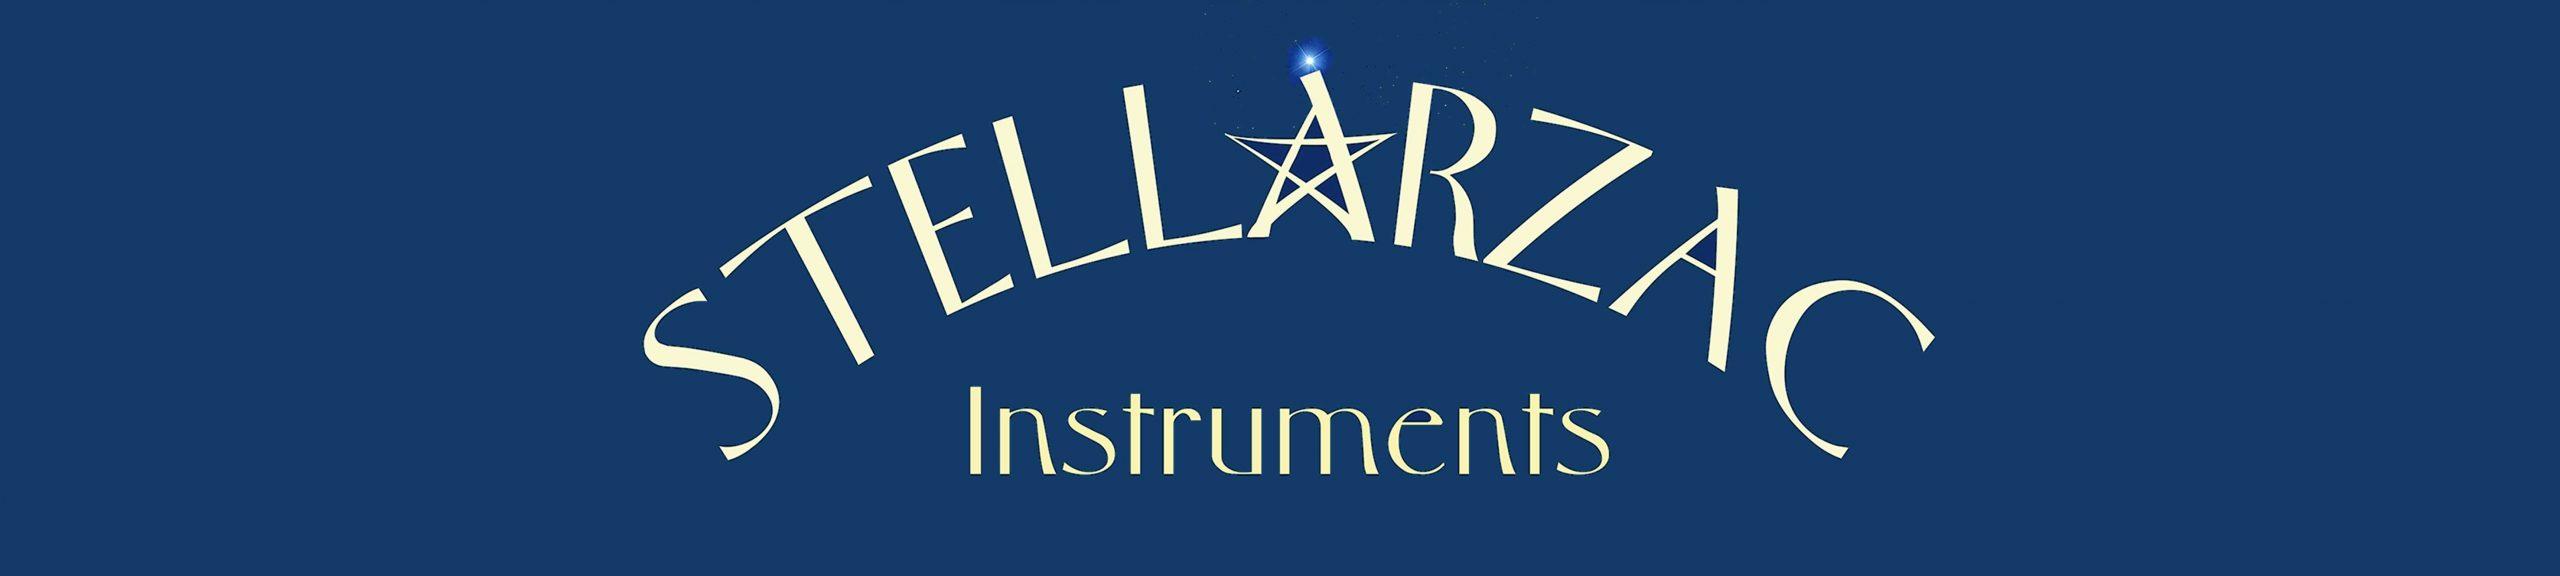 STELLARZAC Instruments